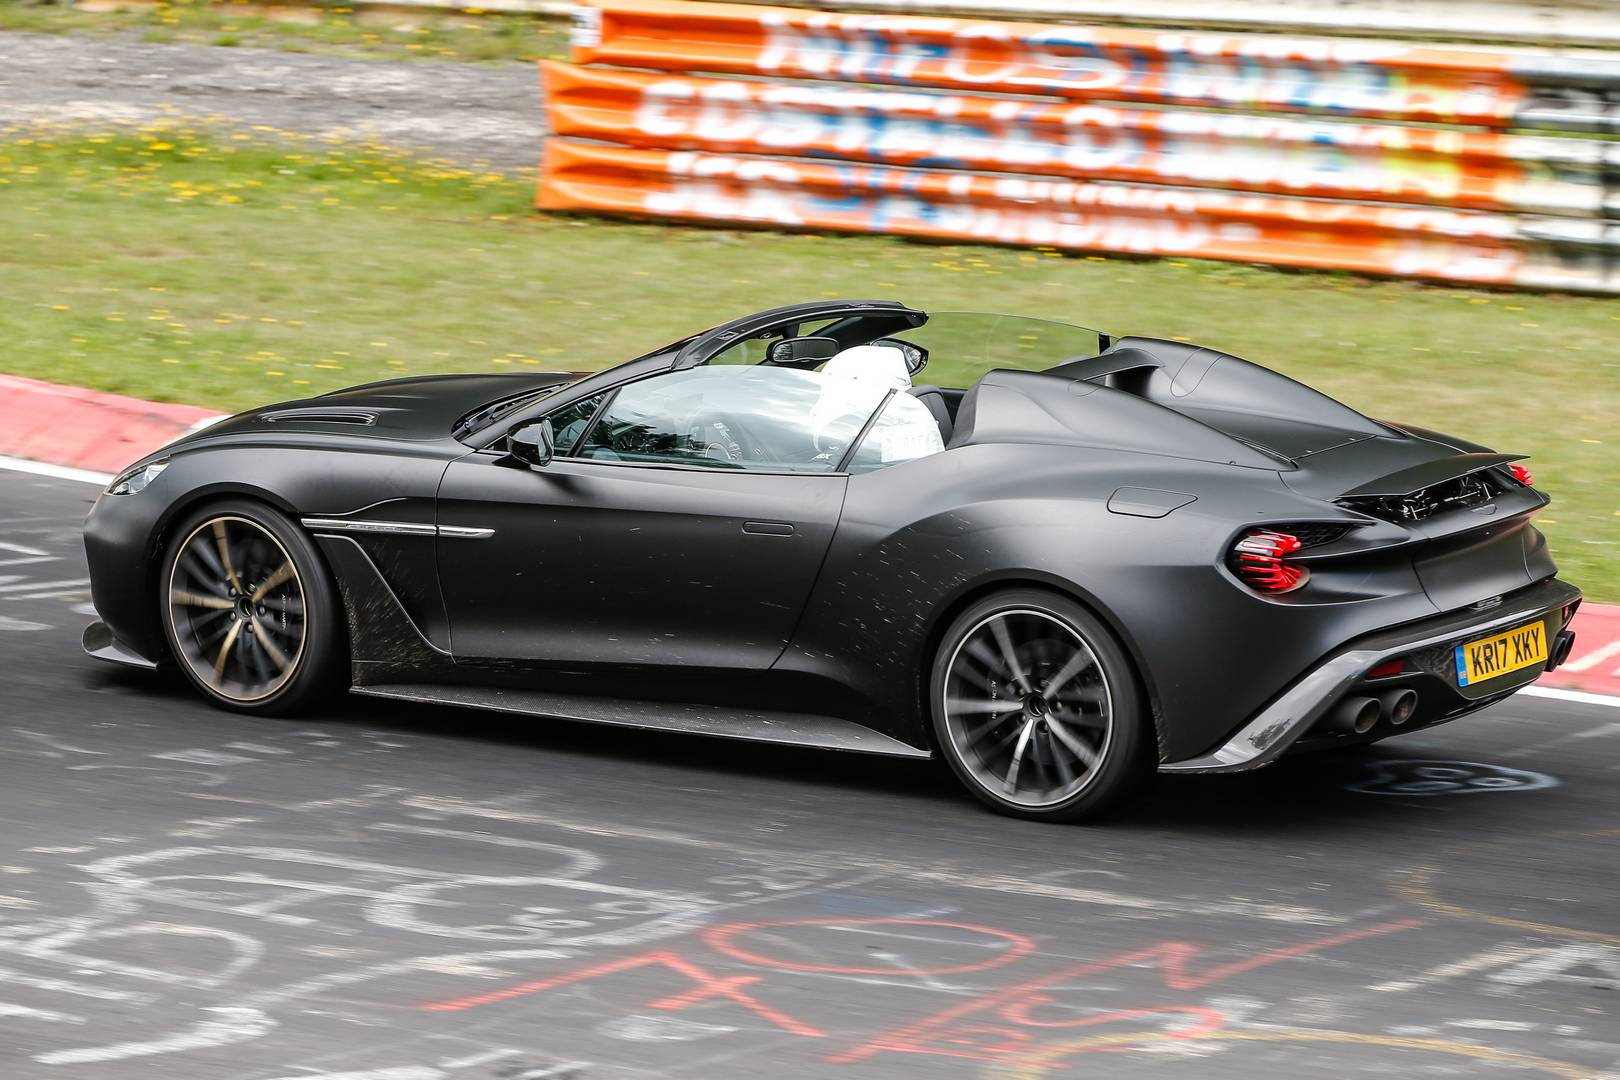 1 Of 28 Zagato Aston Martin Vanquish Speedster Seen For The First Time Gtspirit